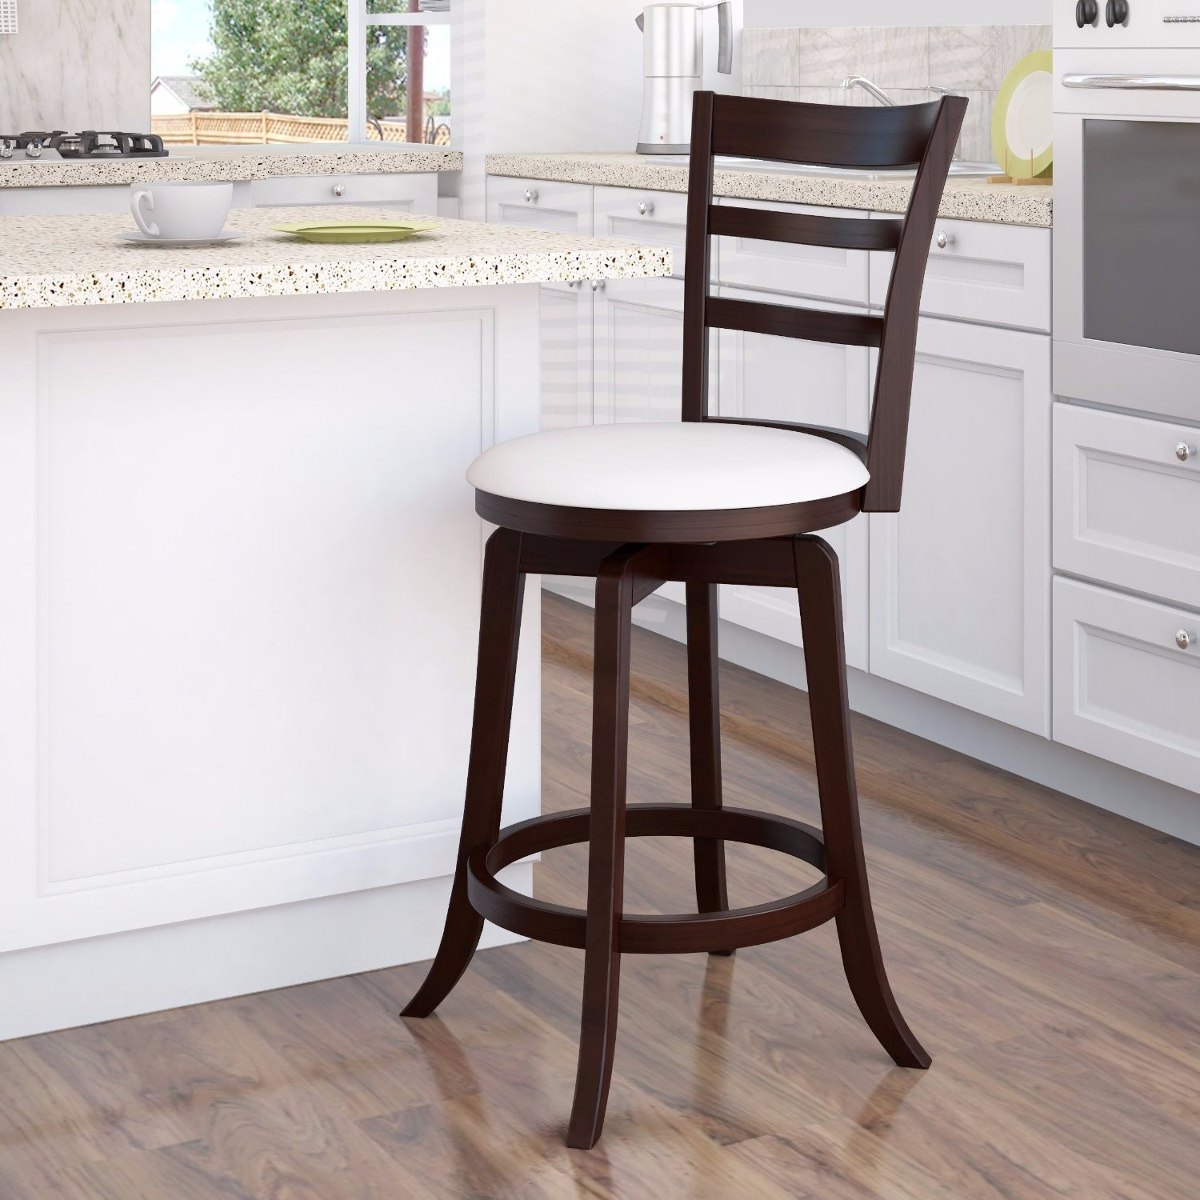 Banco silla giratoria bar cafe barra madera y cuero 91 cm for Precio de sillas para barra